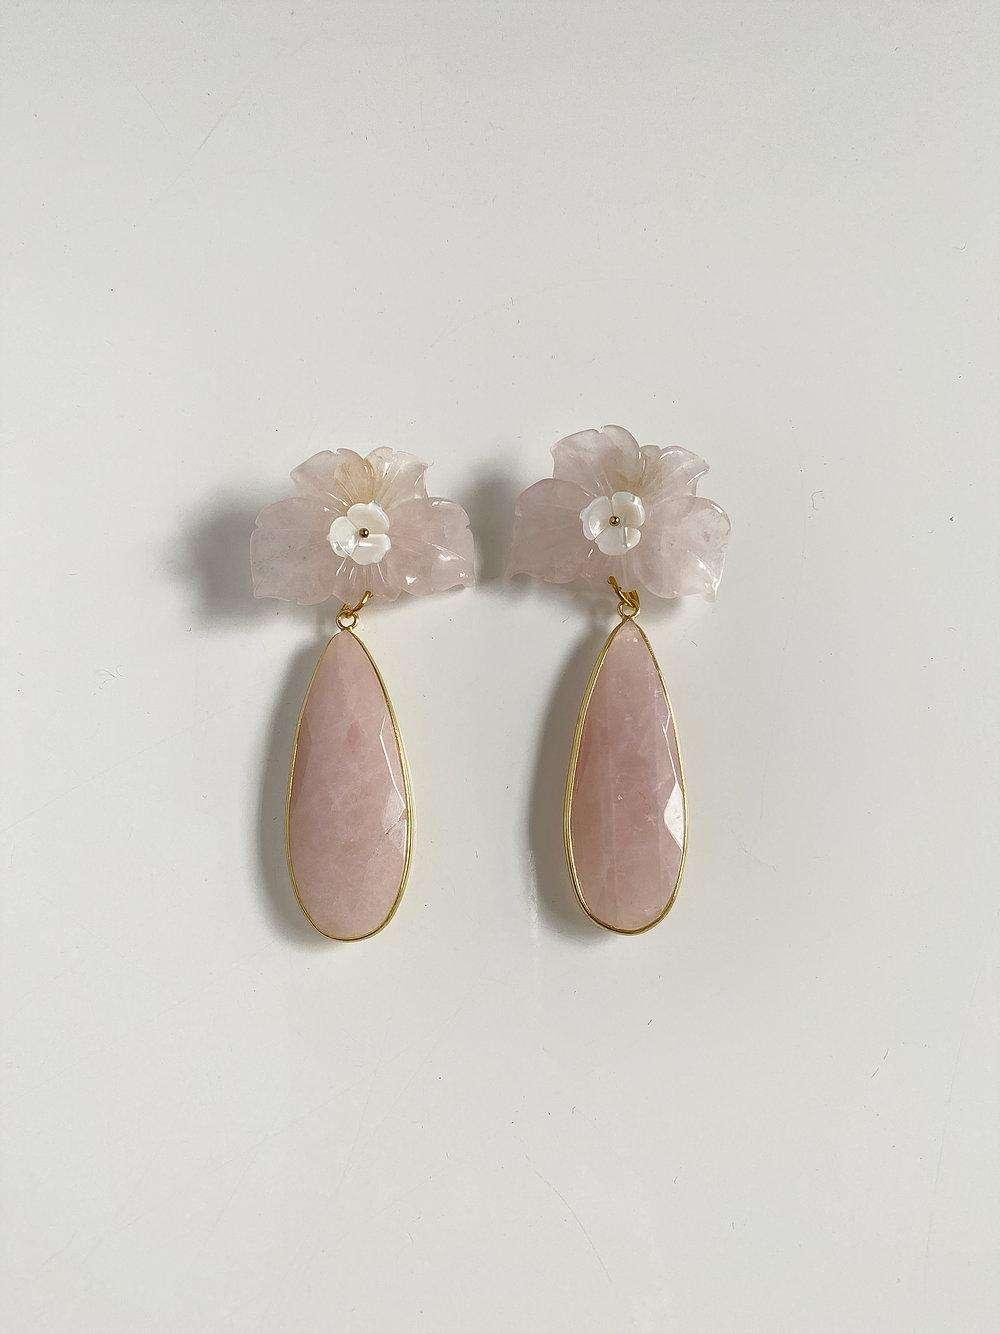 Nicola Bathie Earrings to gift to girly girls